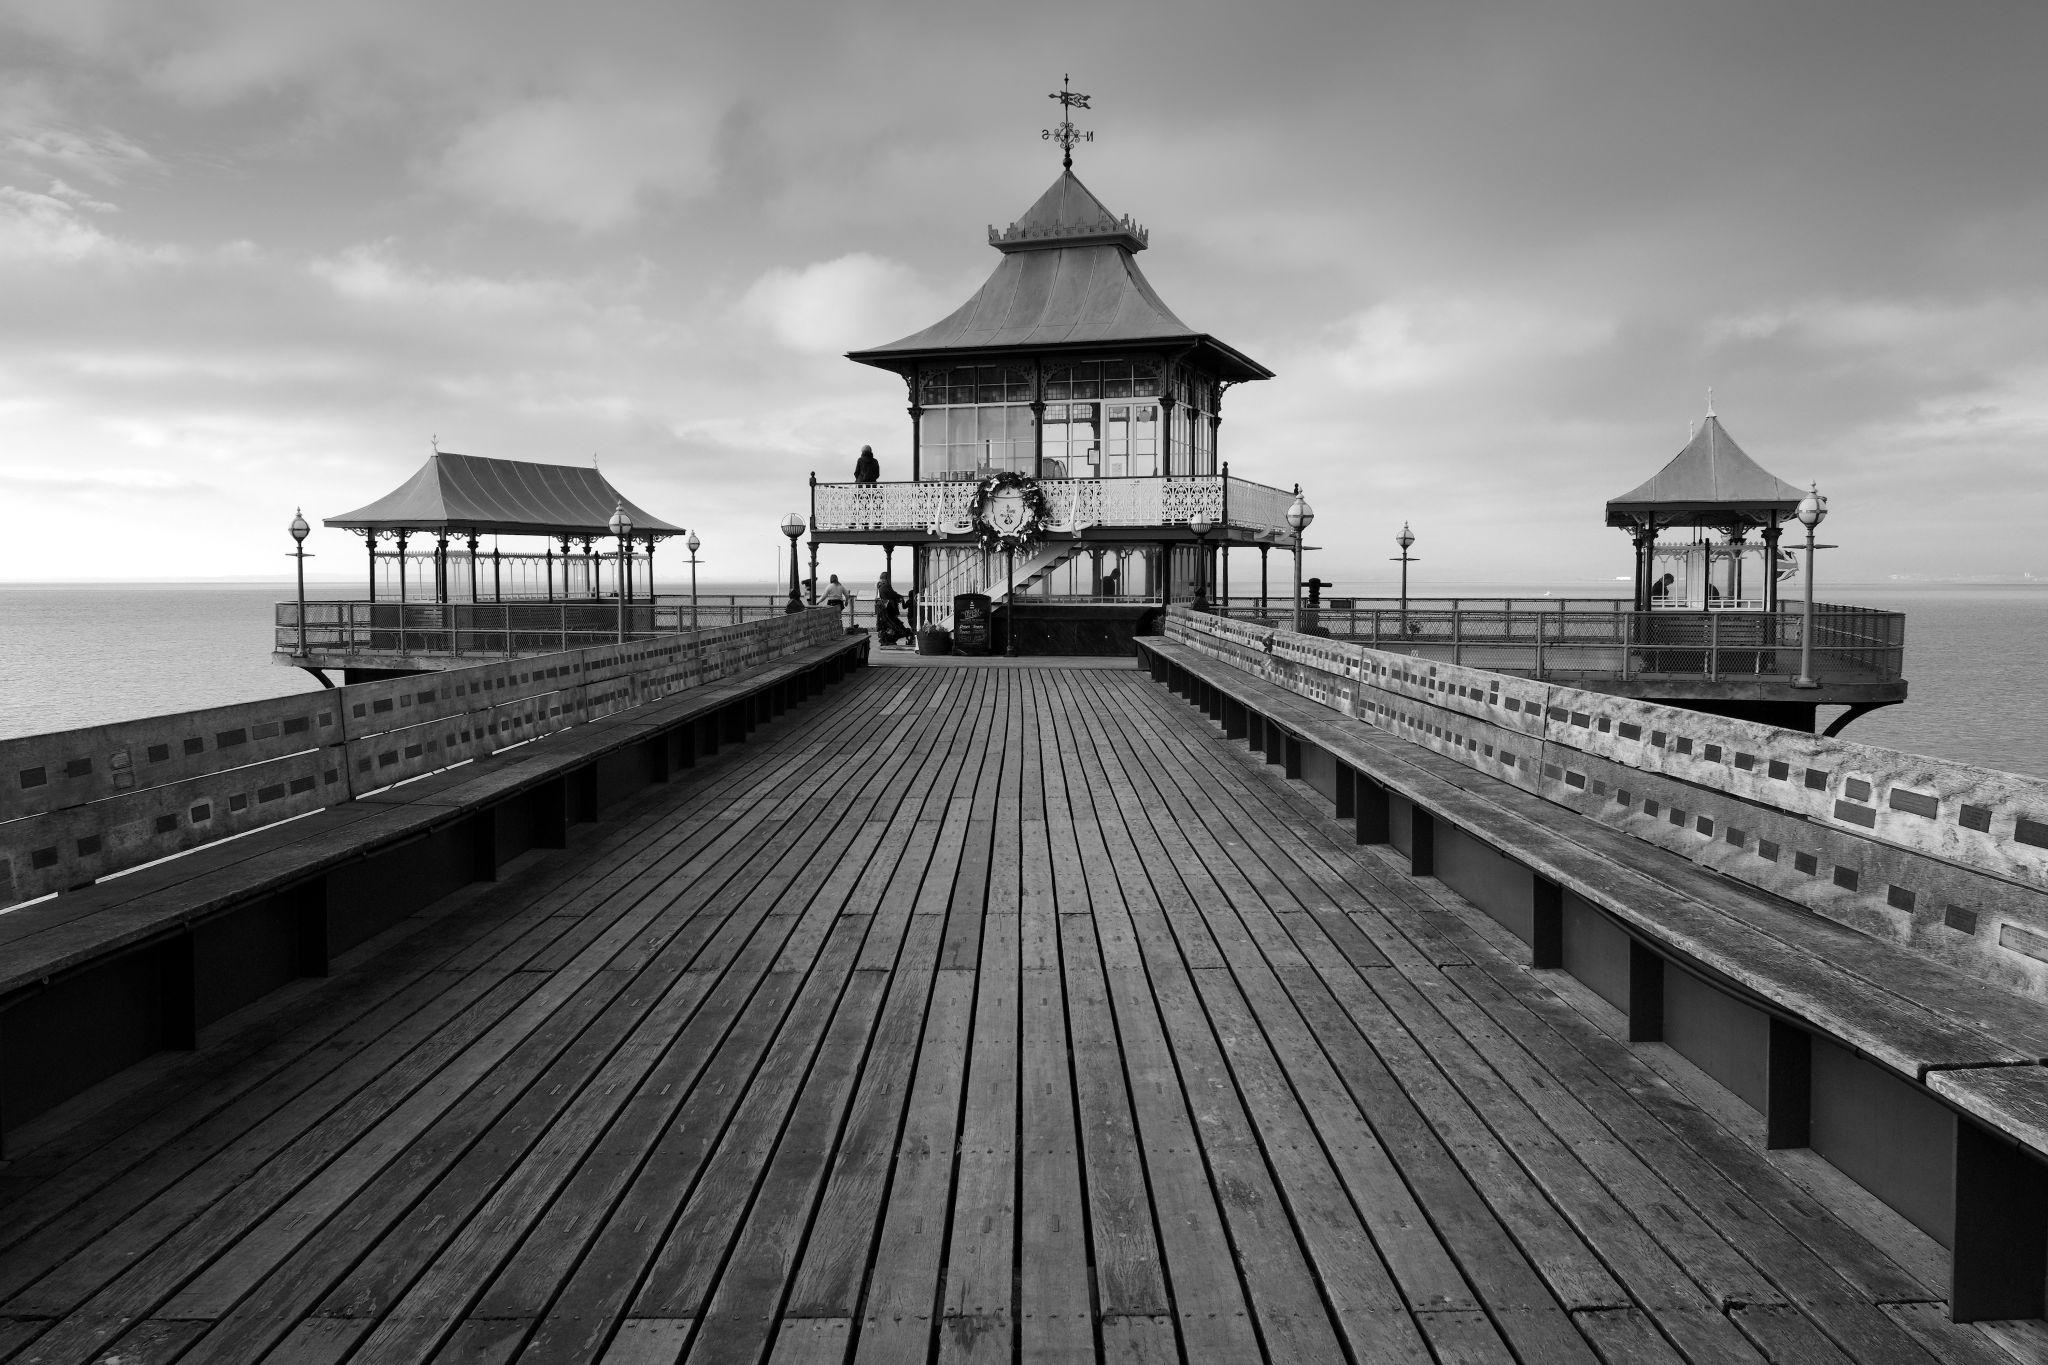 Clevedon Pier, United Kingdom